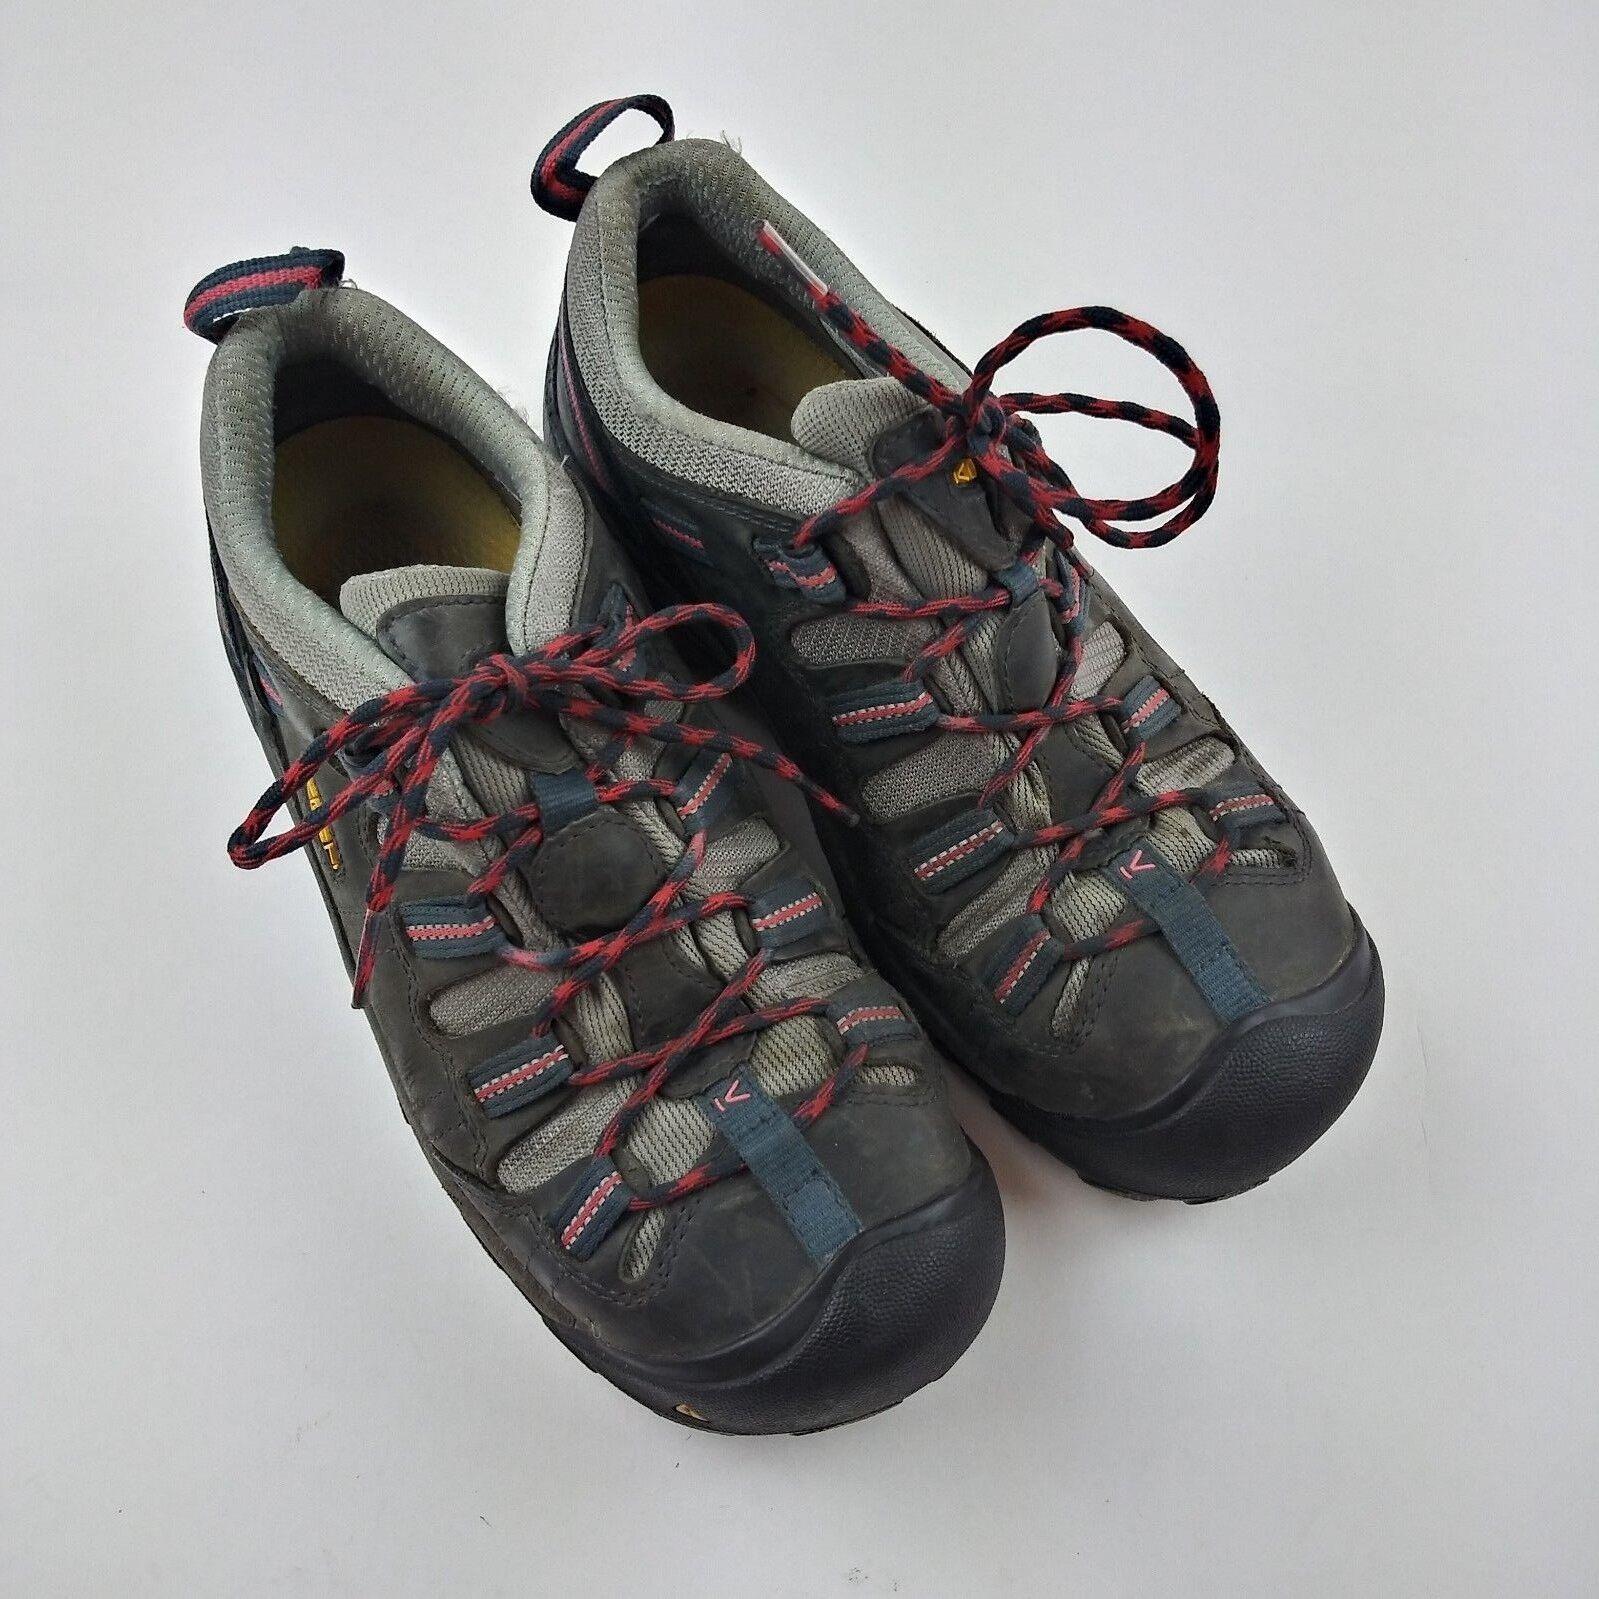 KEEN Utility Men's Size 10 Boulder Low Industrial shoes steel toe Black Red